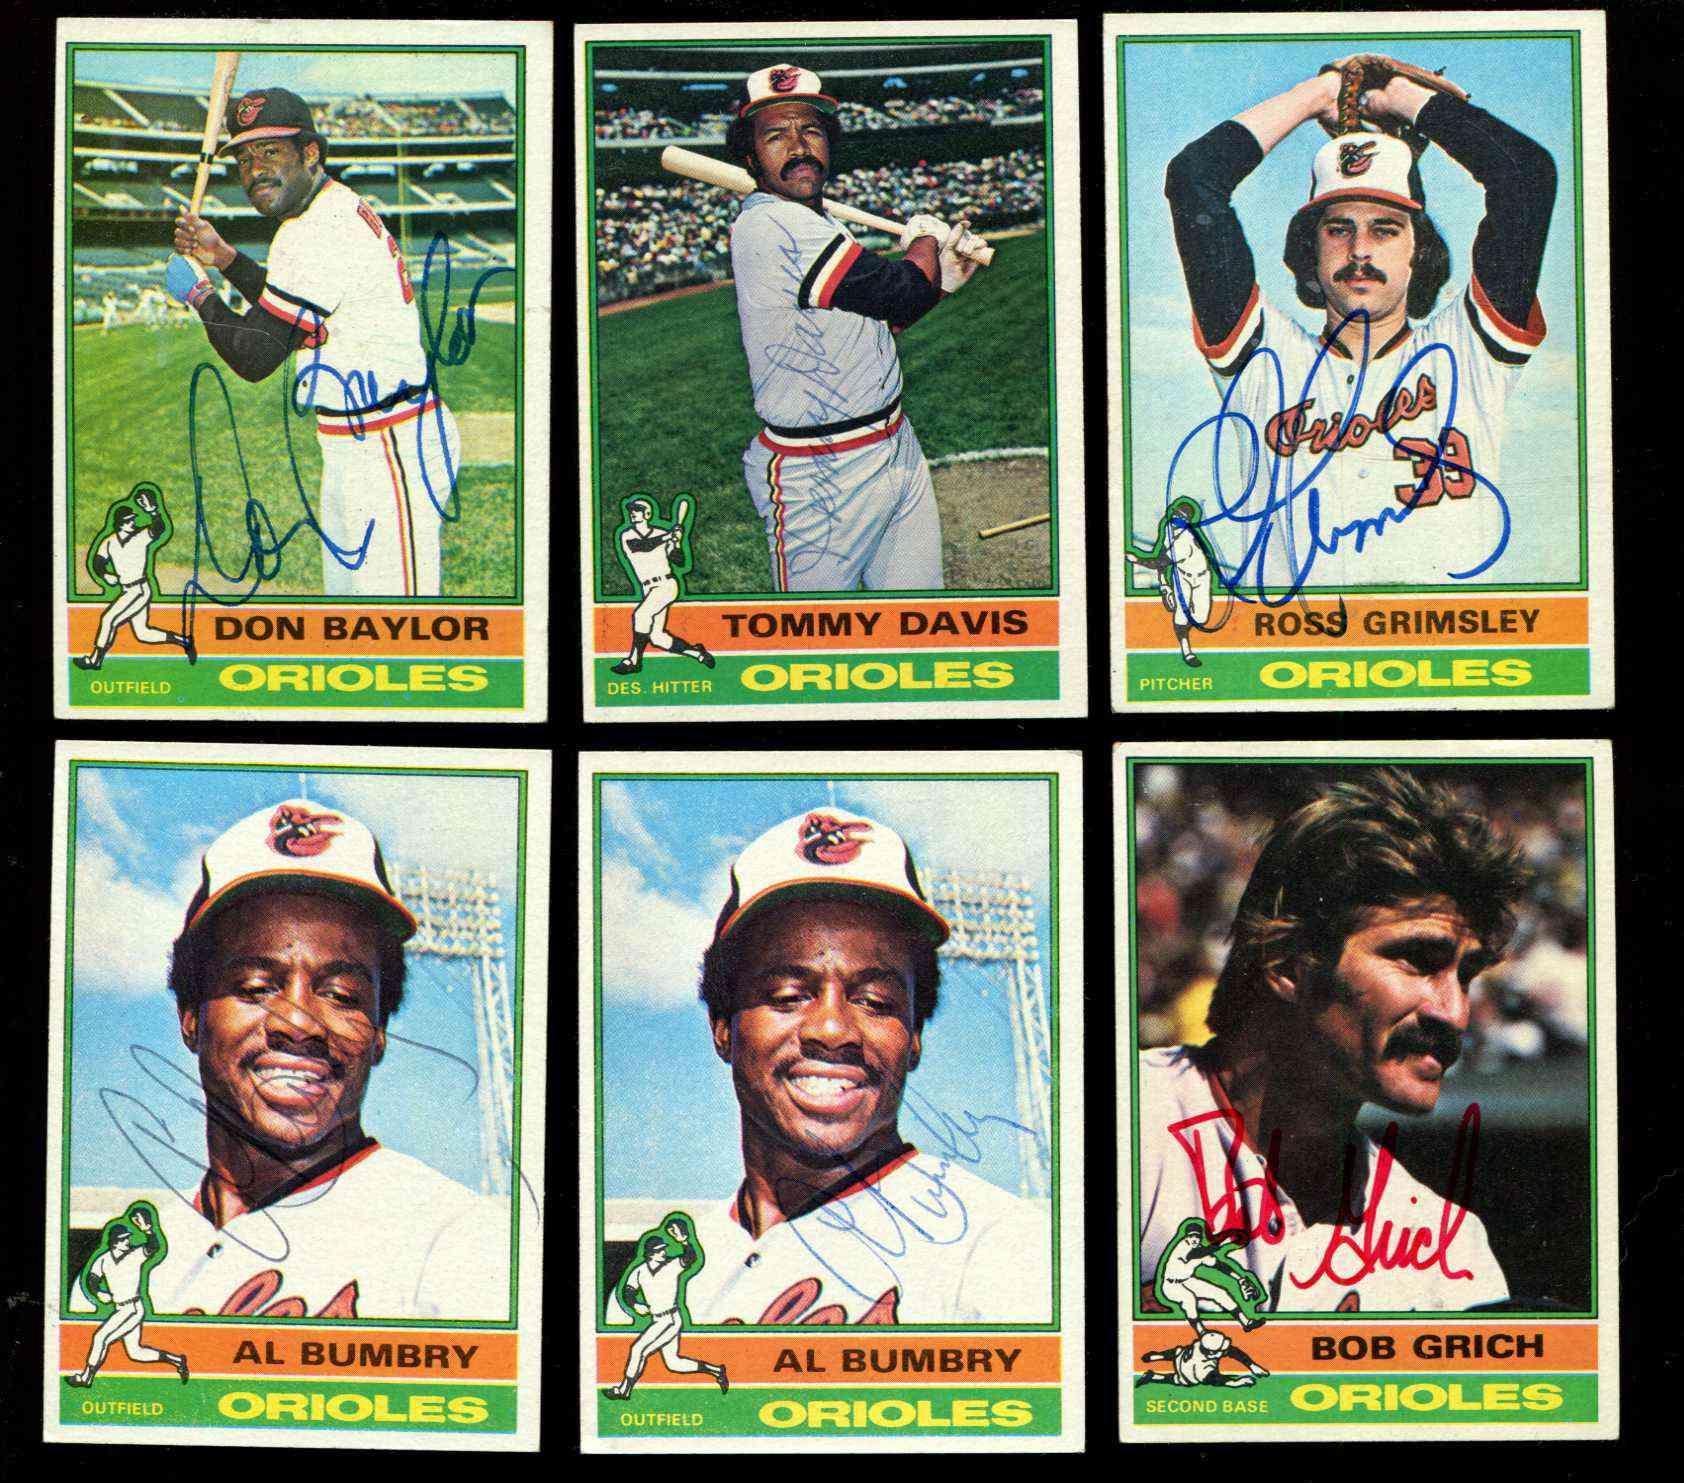 1976 Topps 307 Autographed Al Bumbry Wloa Orioles